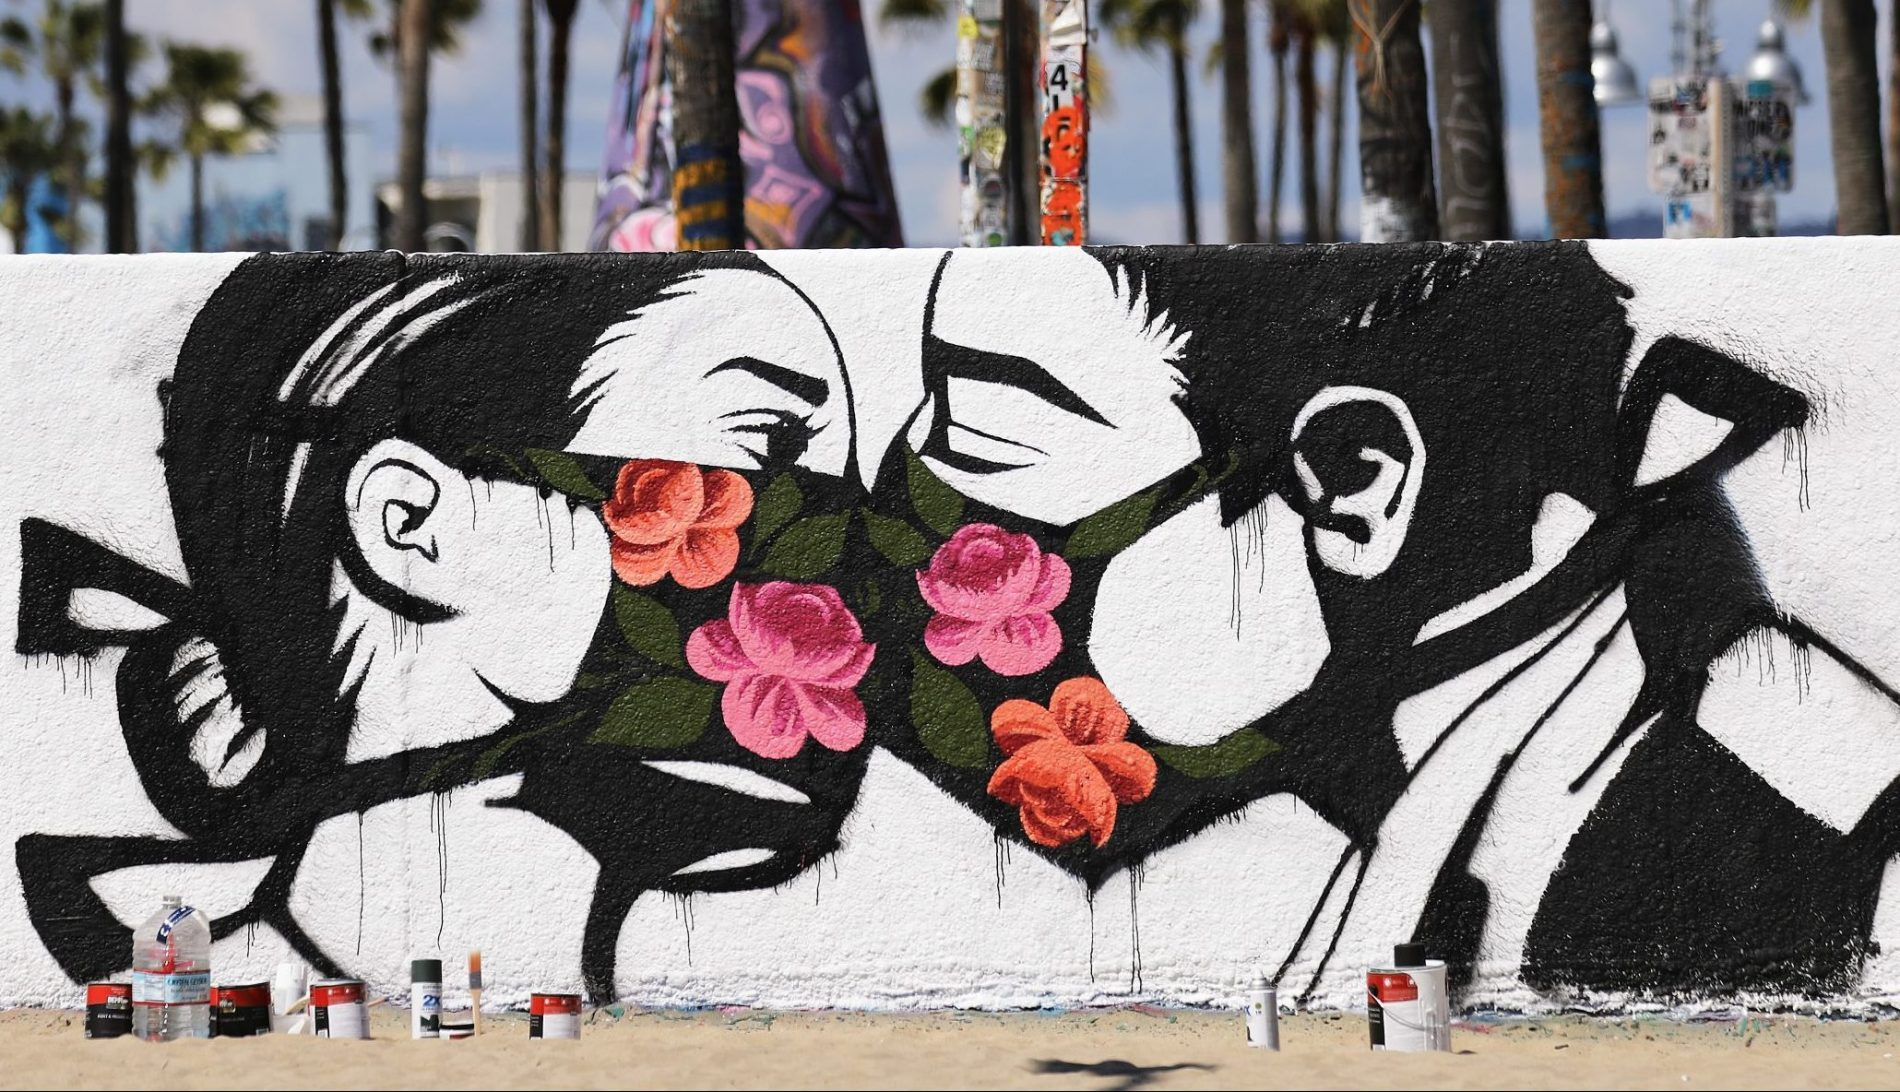 mural kissing coronavirus theGrio.com